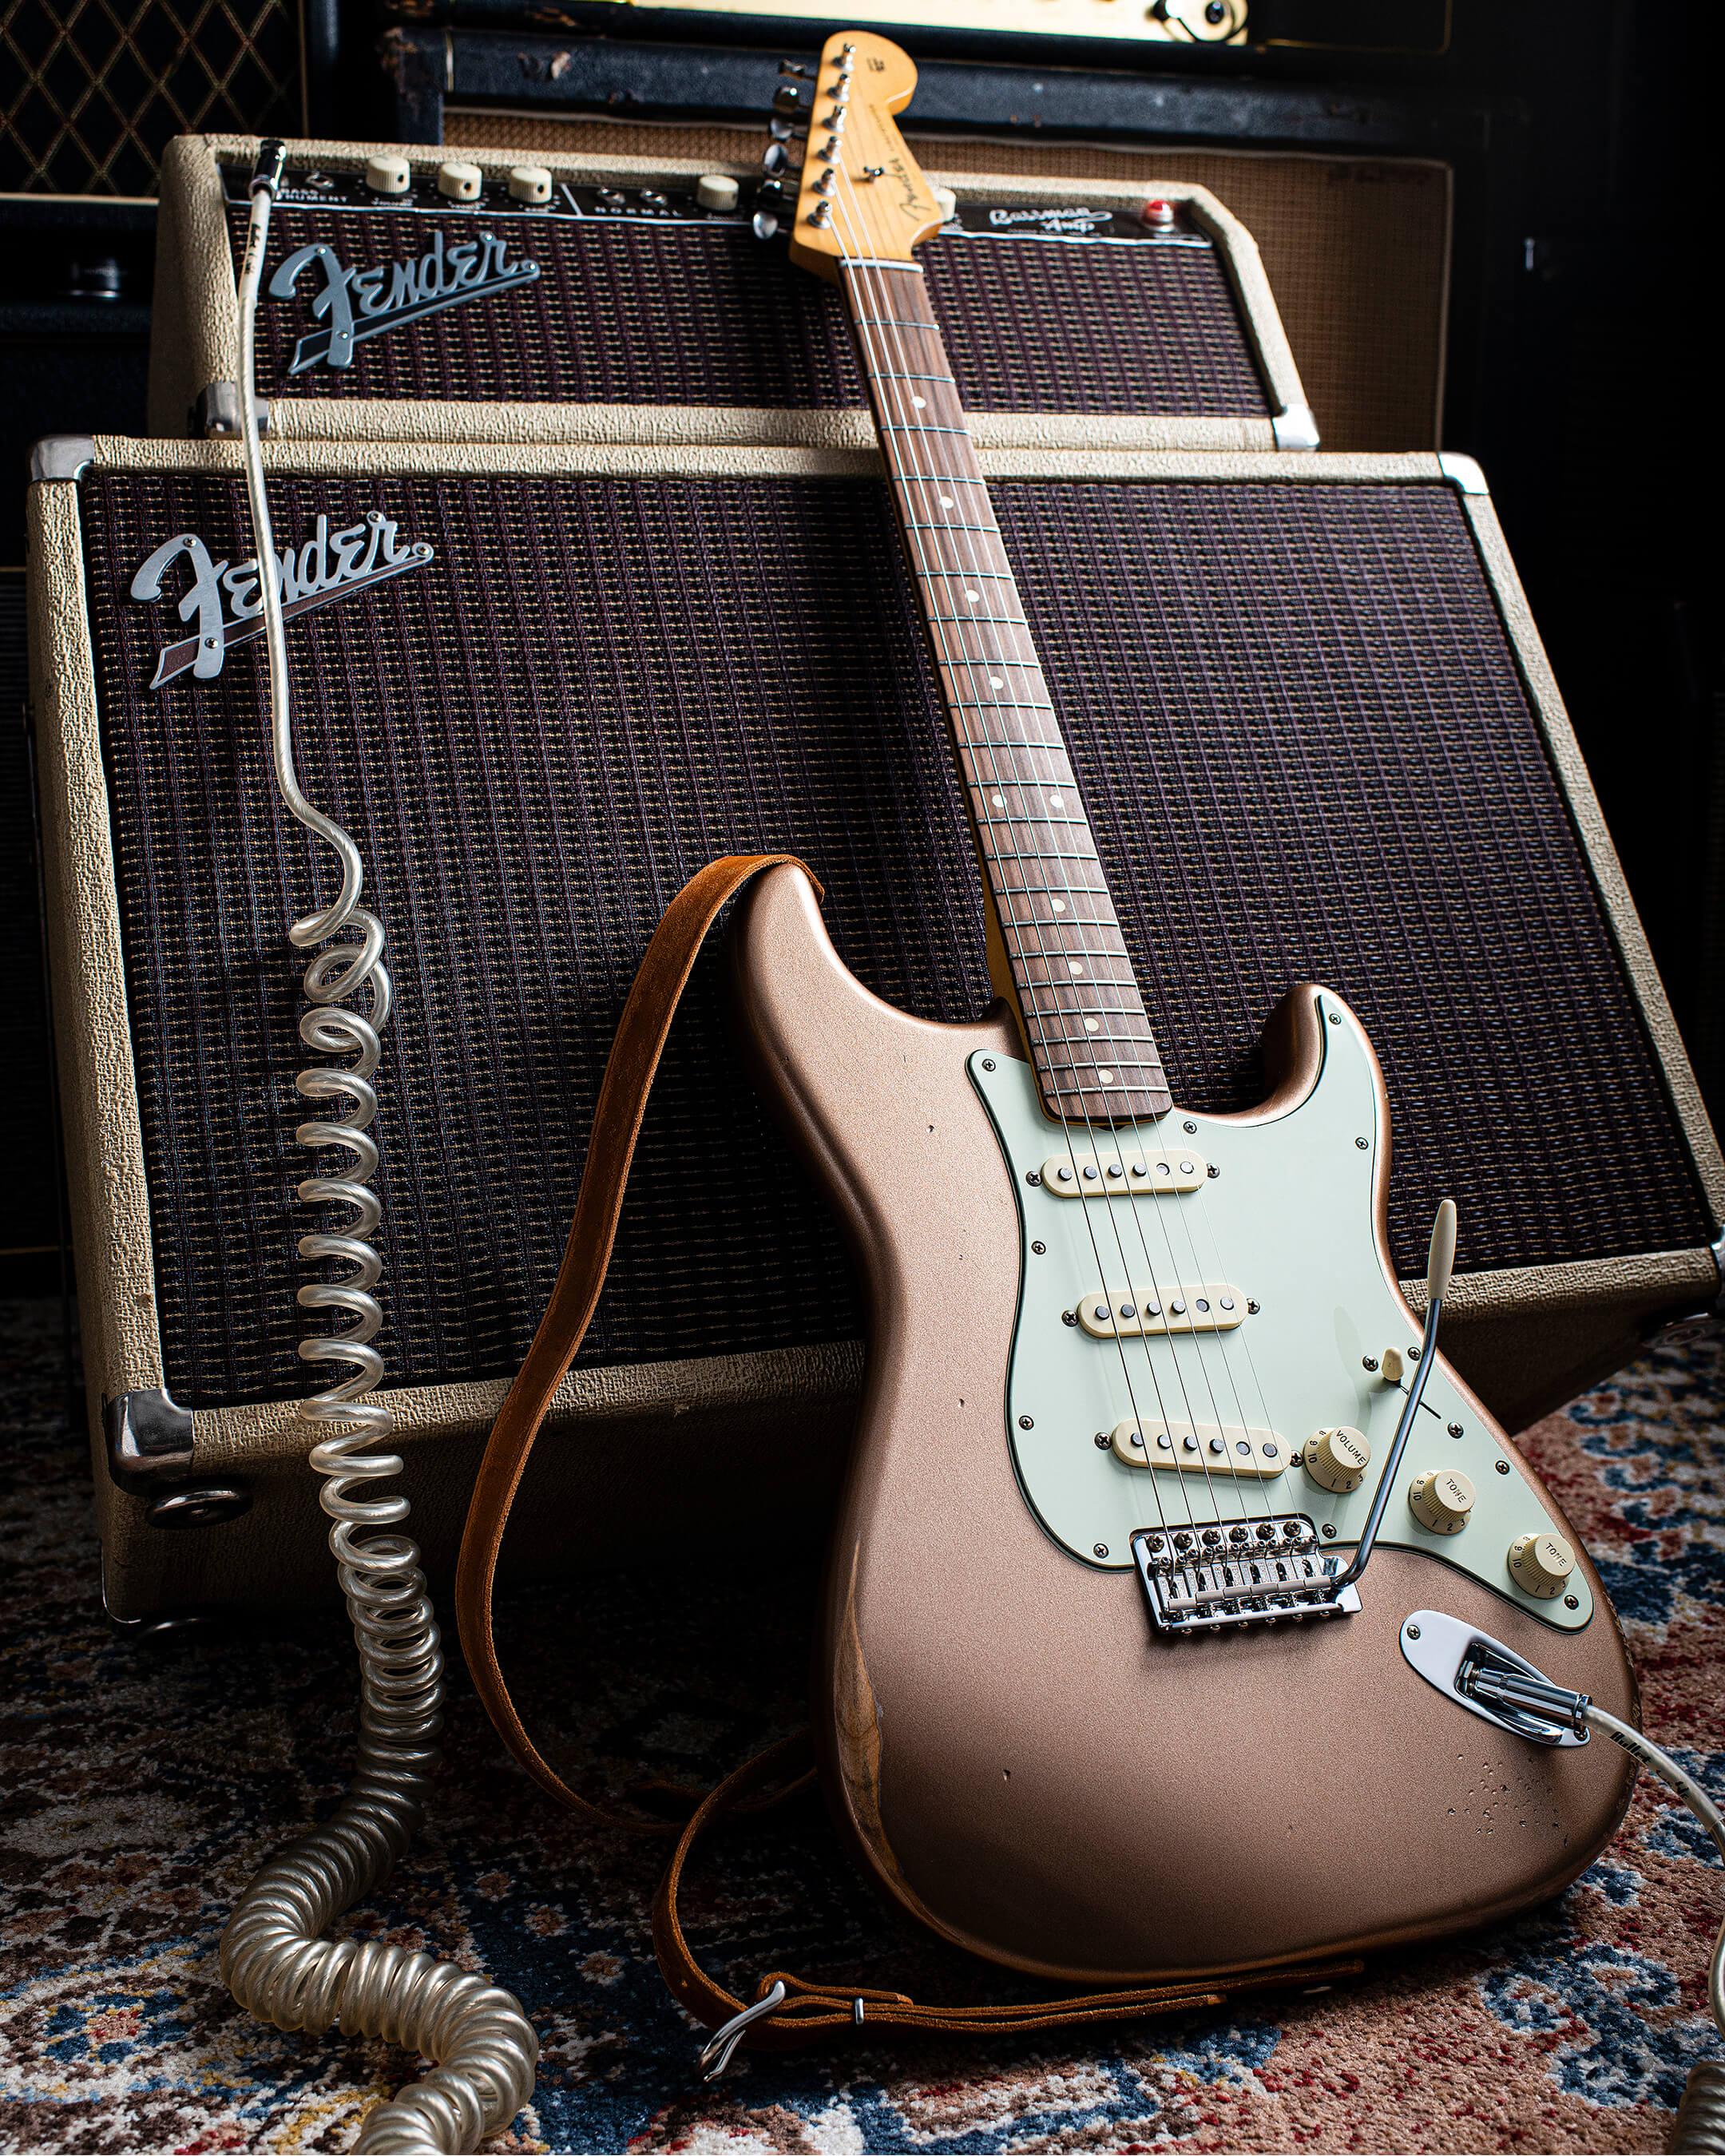 Fender Vintera Road Worn 60s Stratocaster